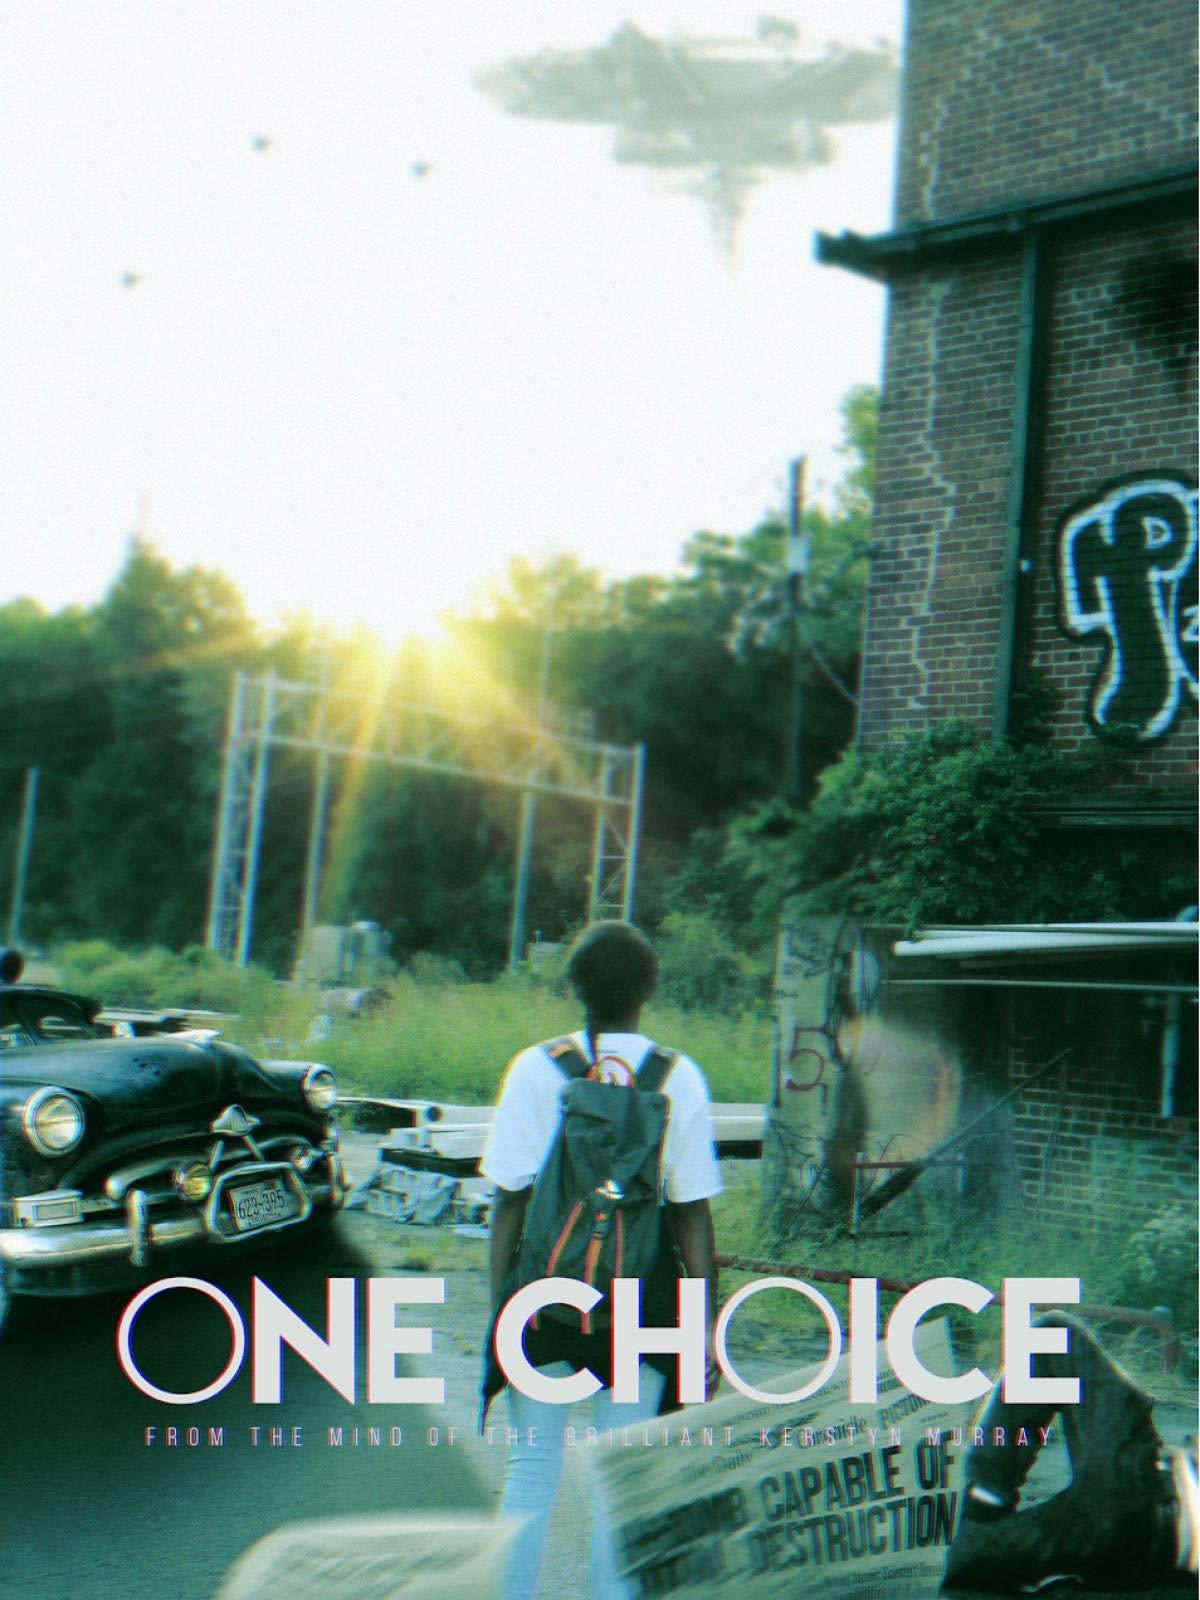 One Choice